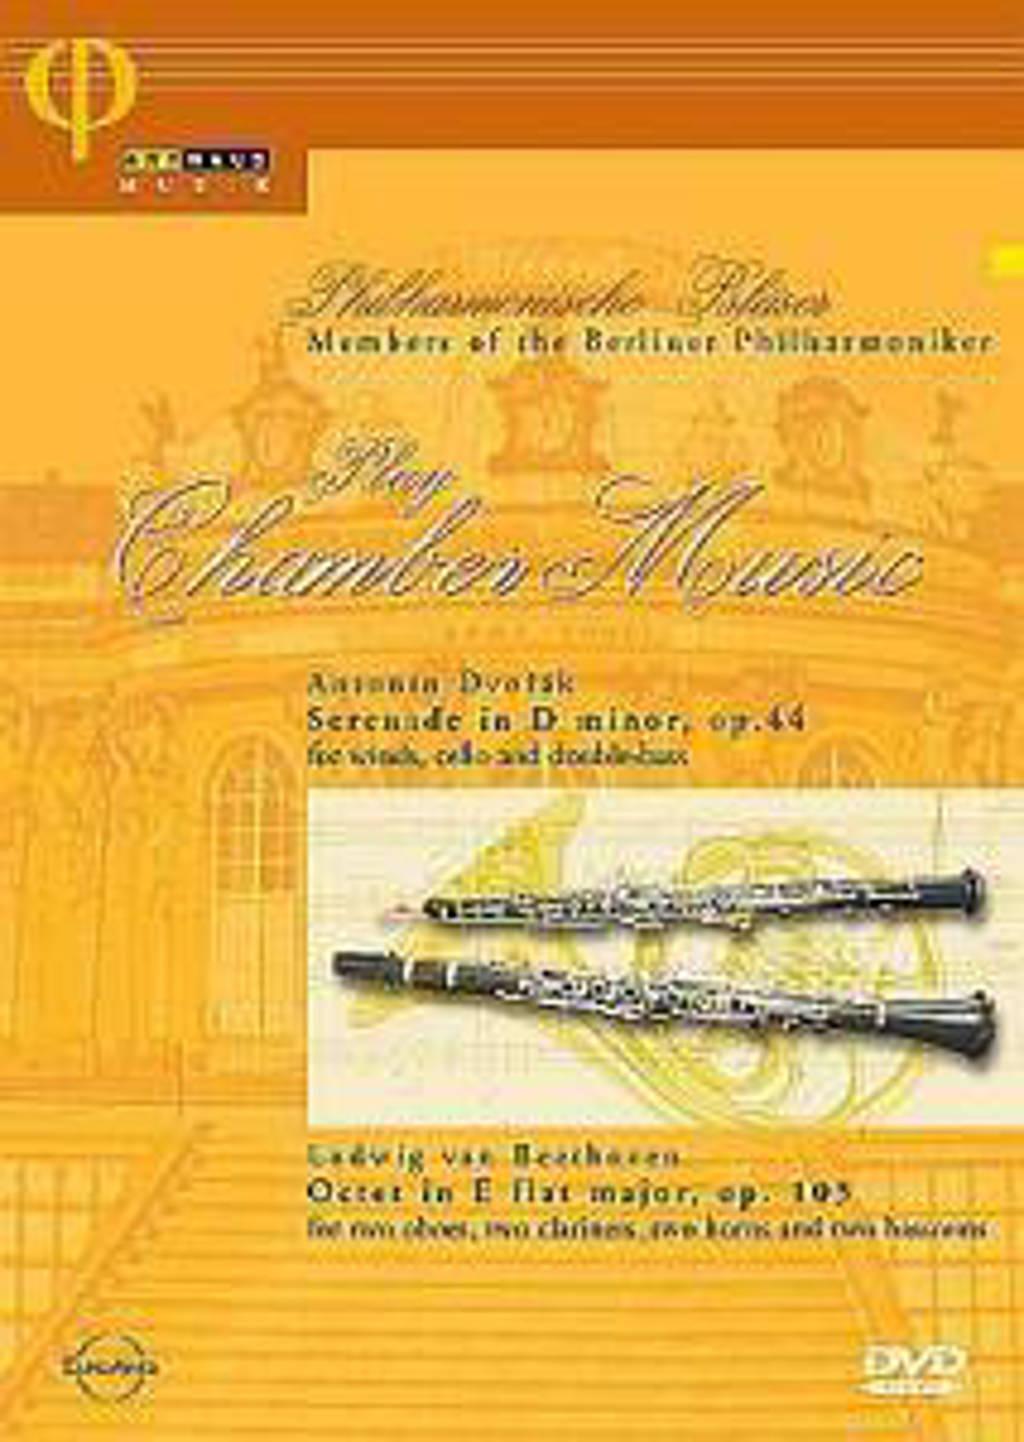 Beethoven, Dvorbk Kamermuziek (DVD)